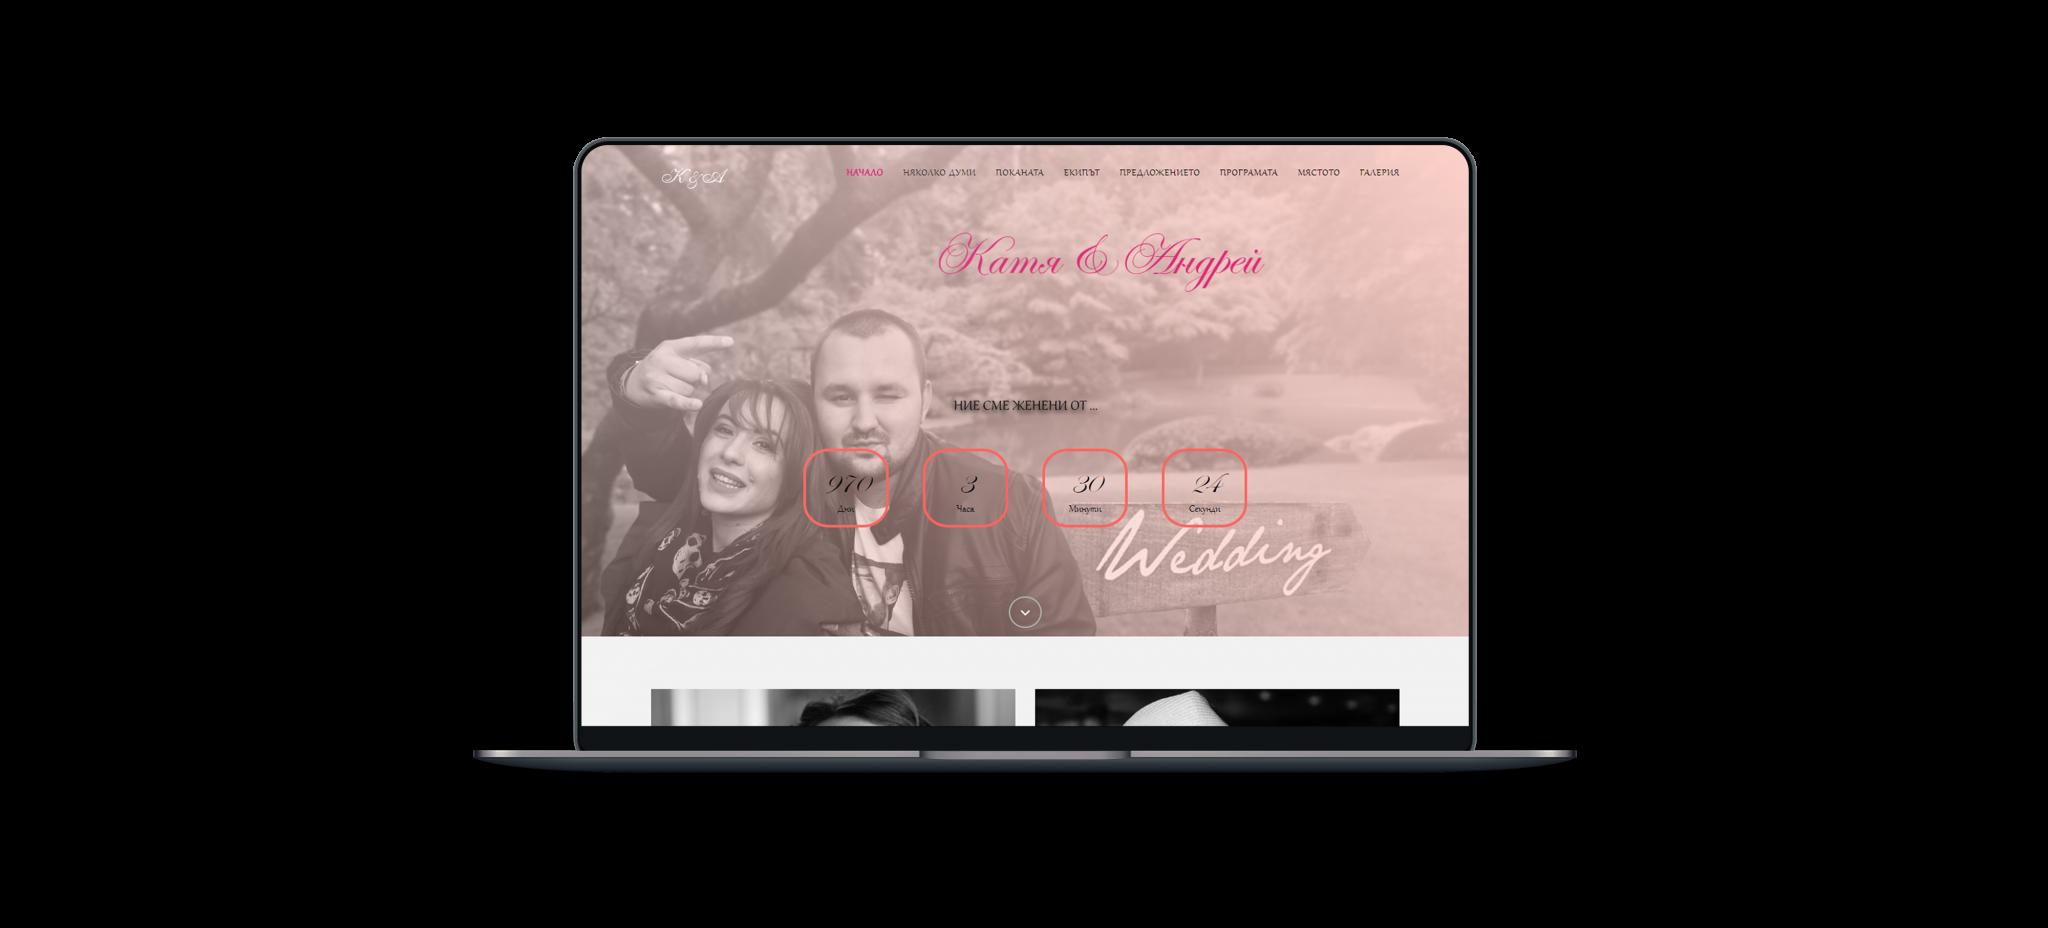 Katia & Andrei Wedding